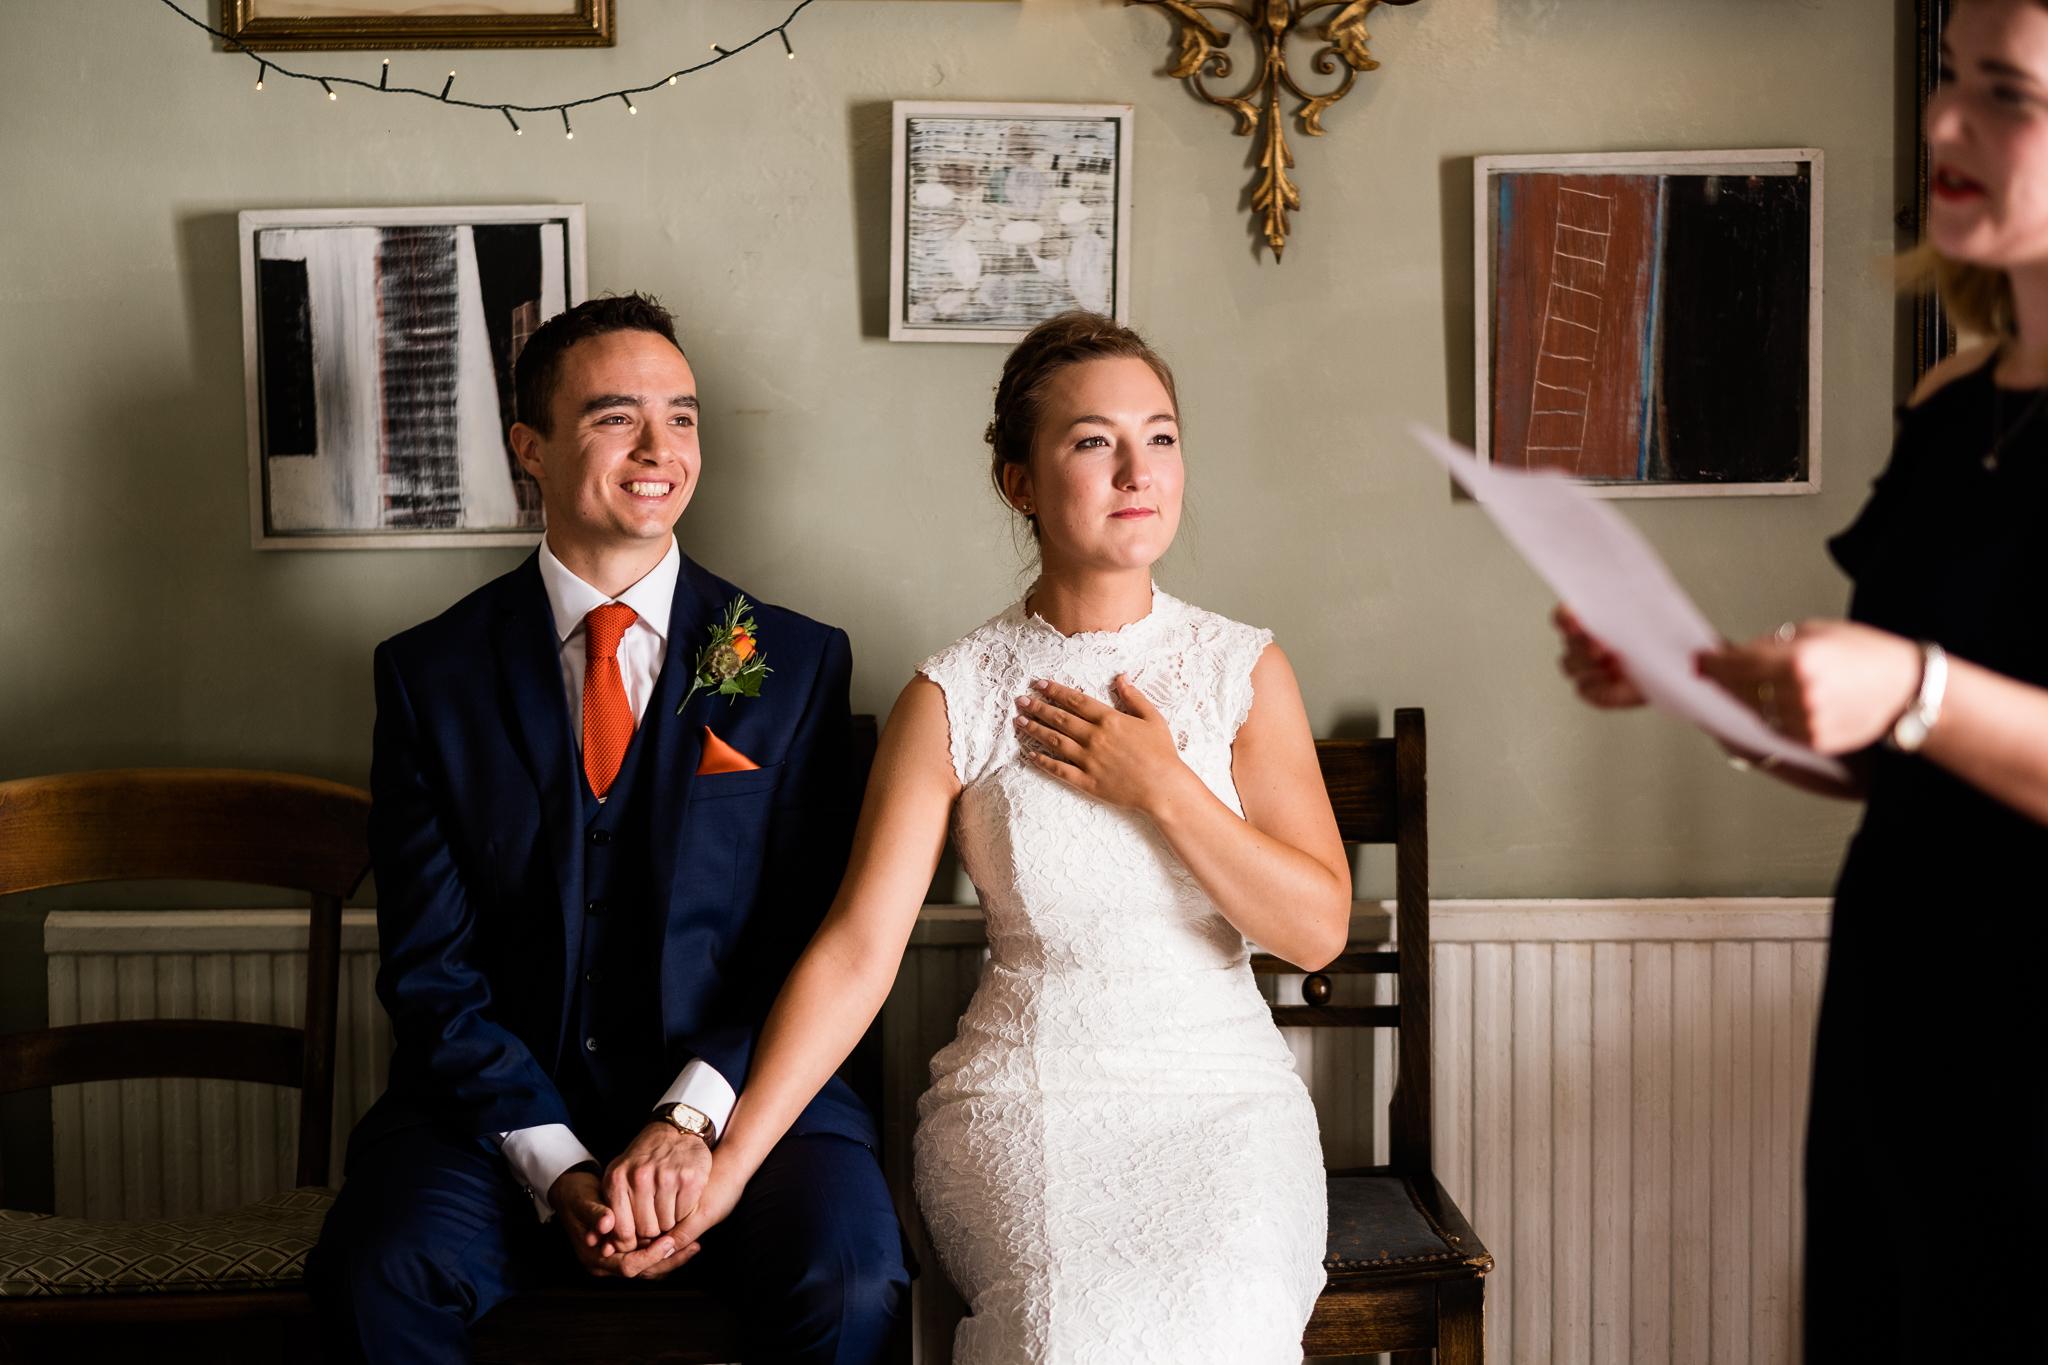 Relaxed Documentary Wedding Photography at The Wizard Inn, Alderley Edge Cheshire - Jenny Harper-30.jpg